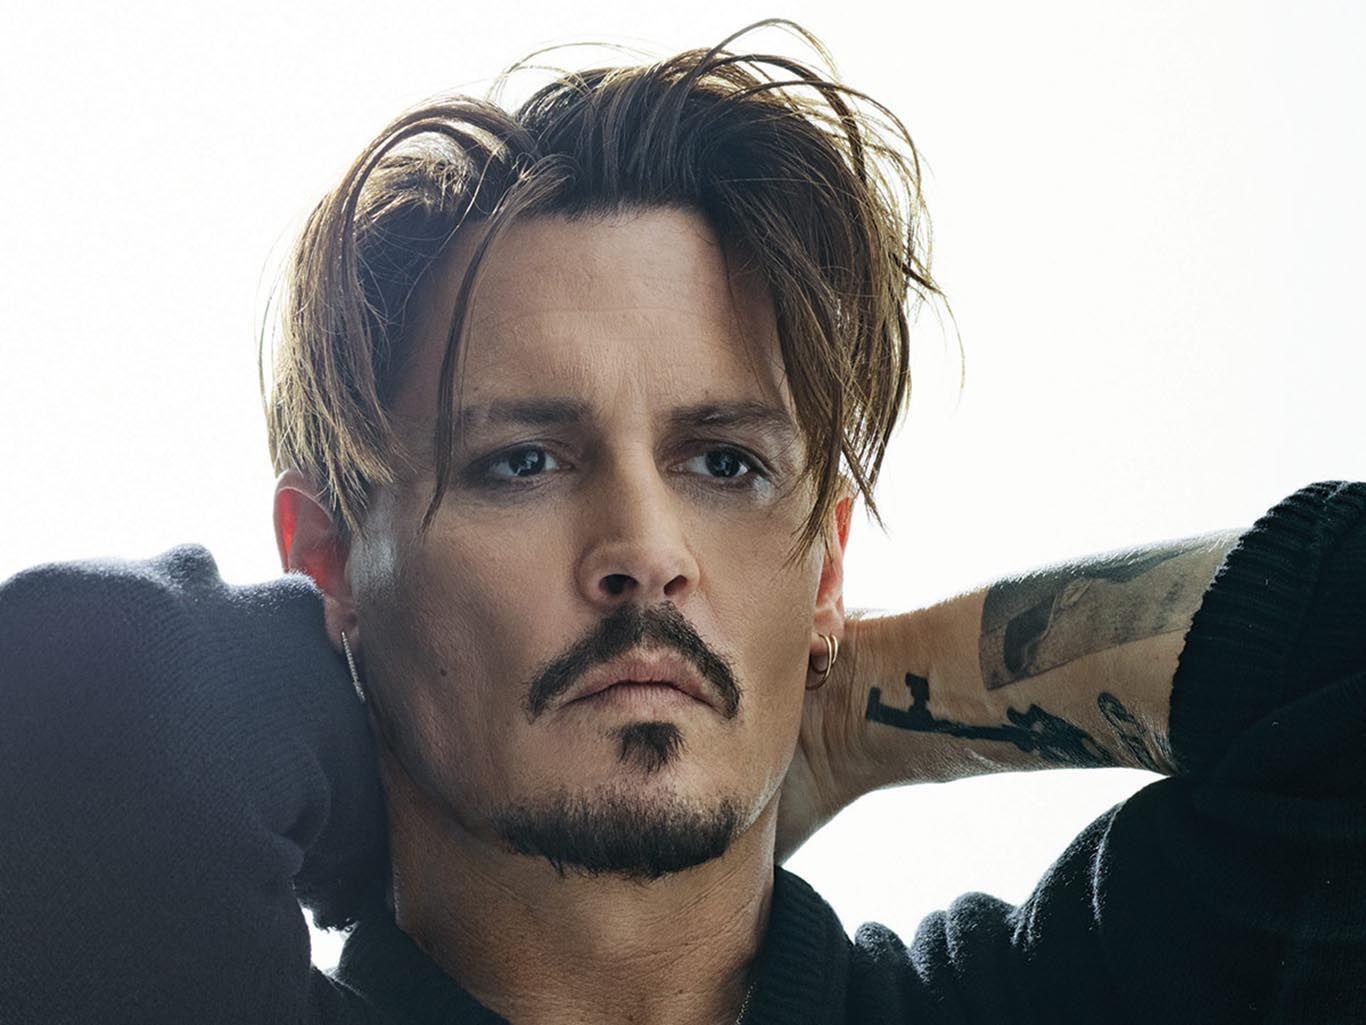 7 Fakta Kasus KDRT Amber Heard Kepada Johnny Depp